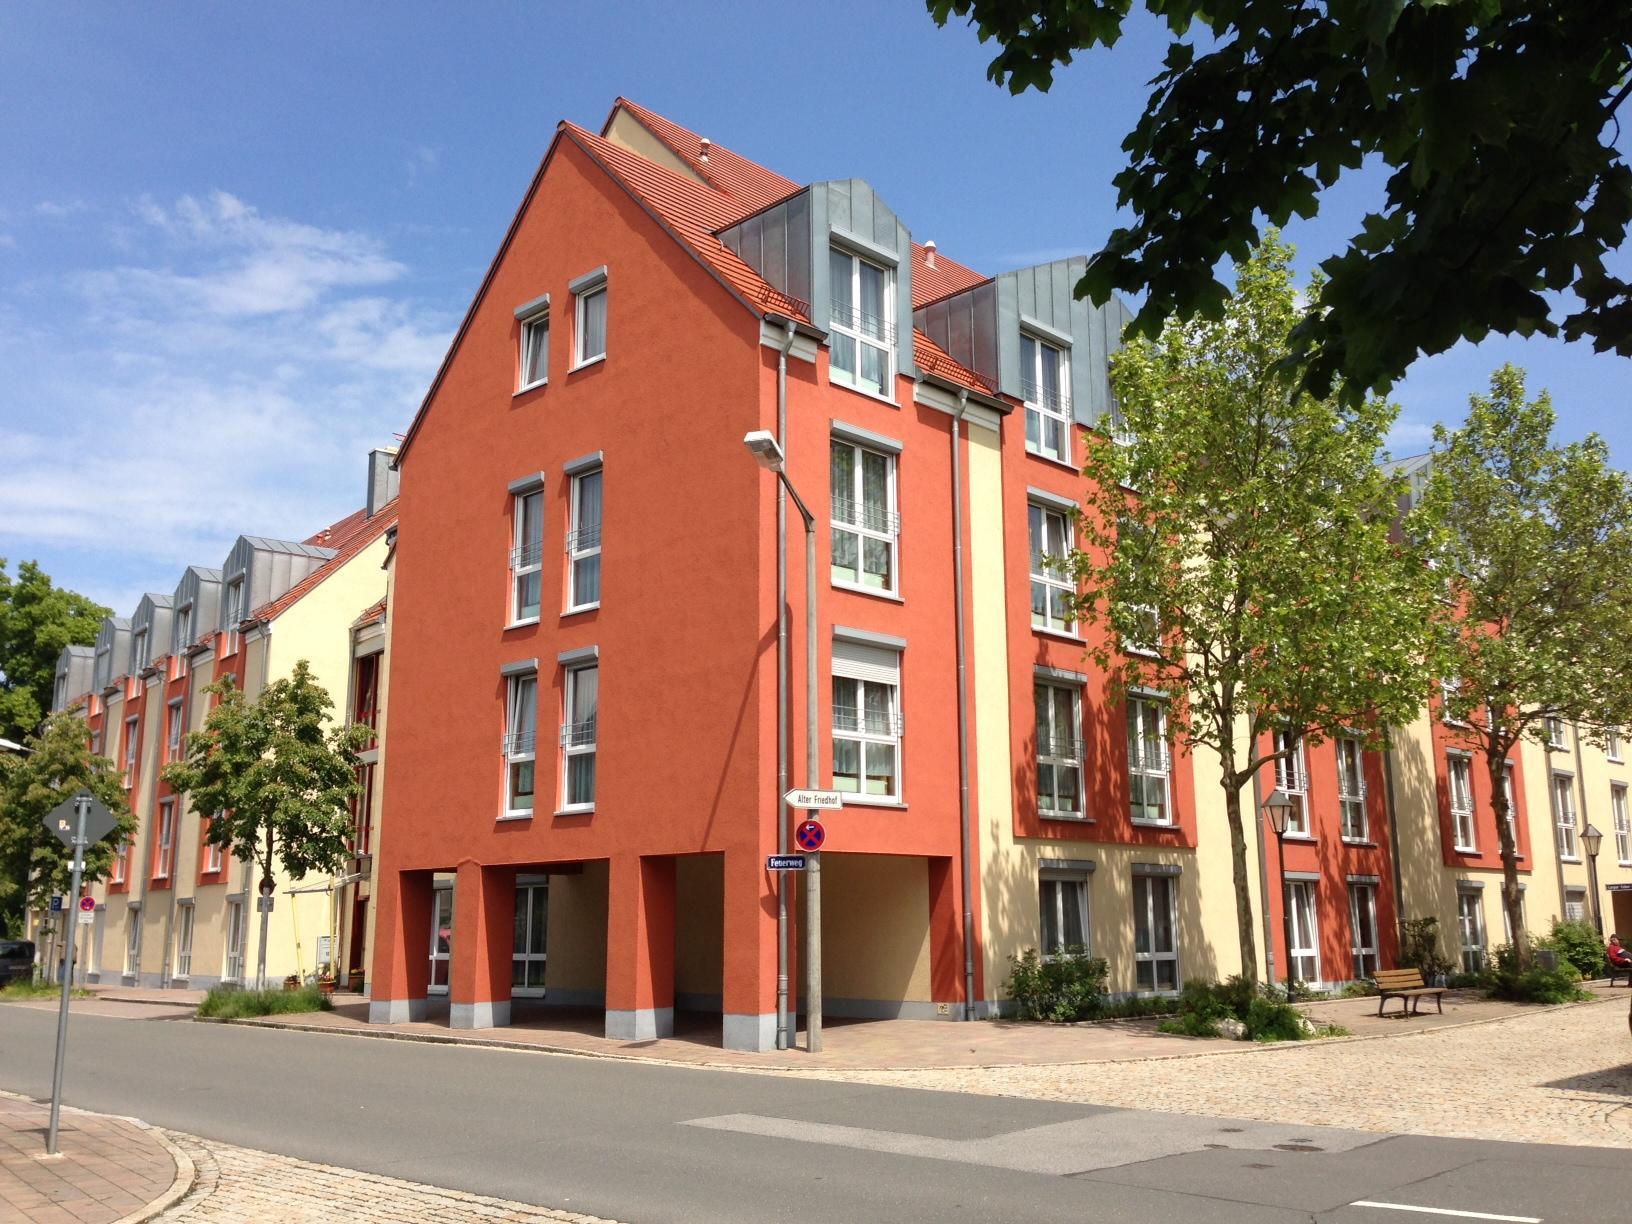 Seniorendomizil Guttknechtshof